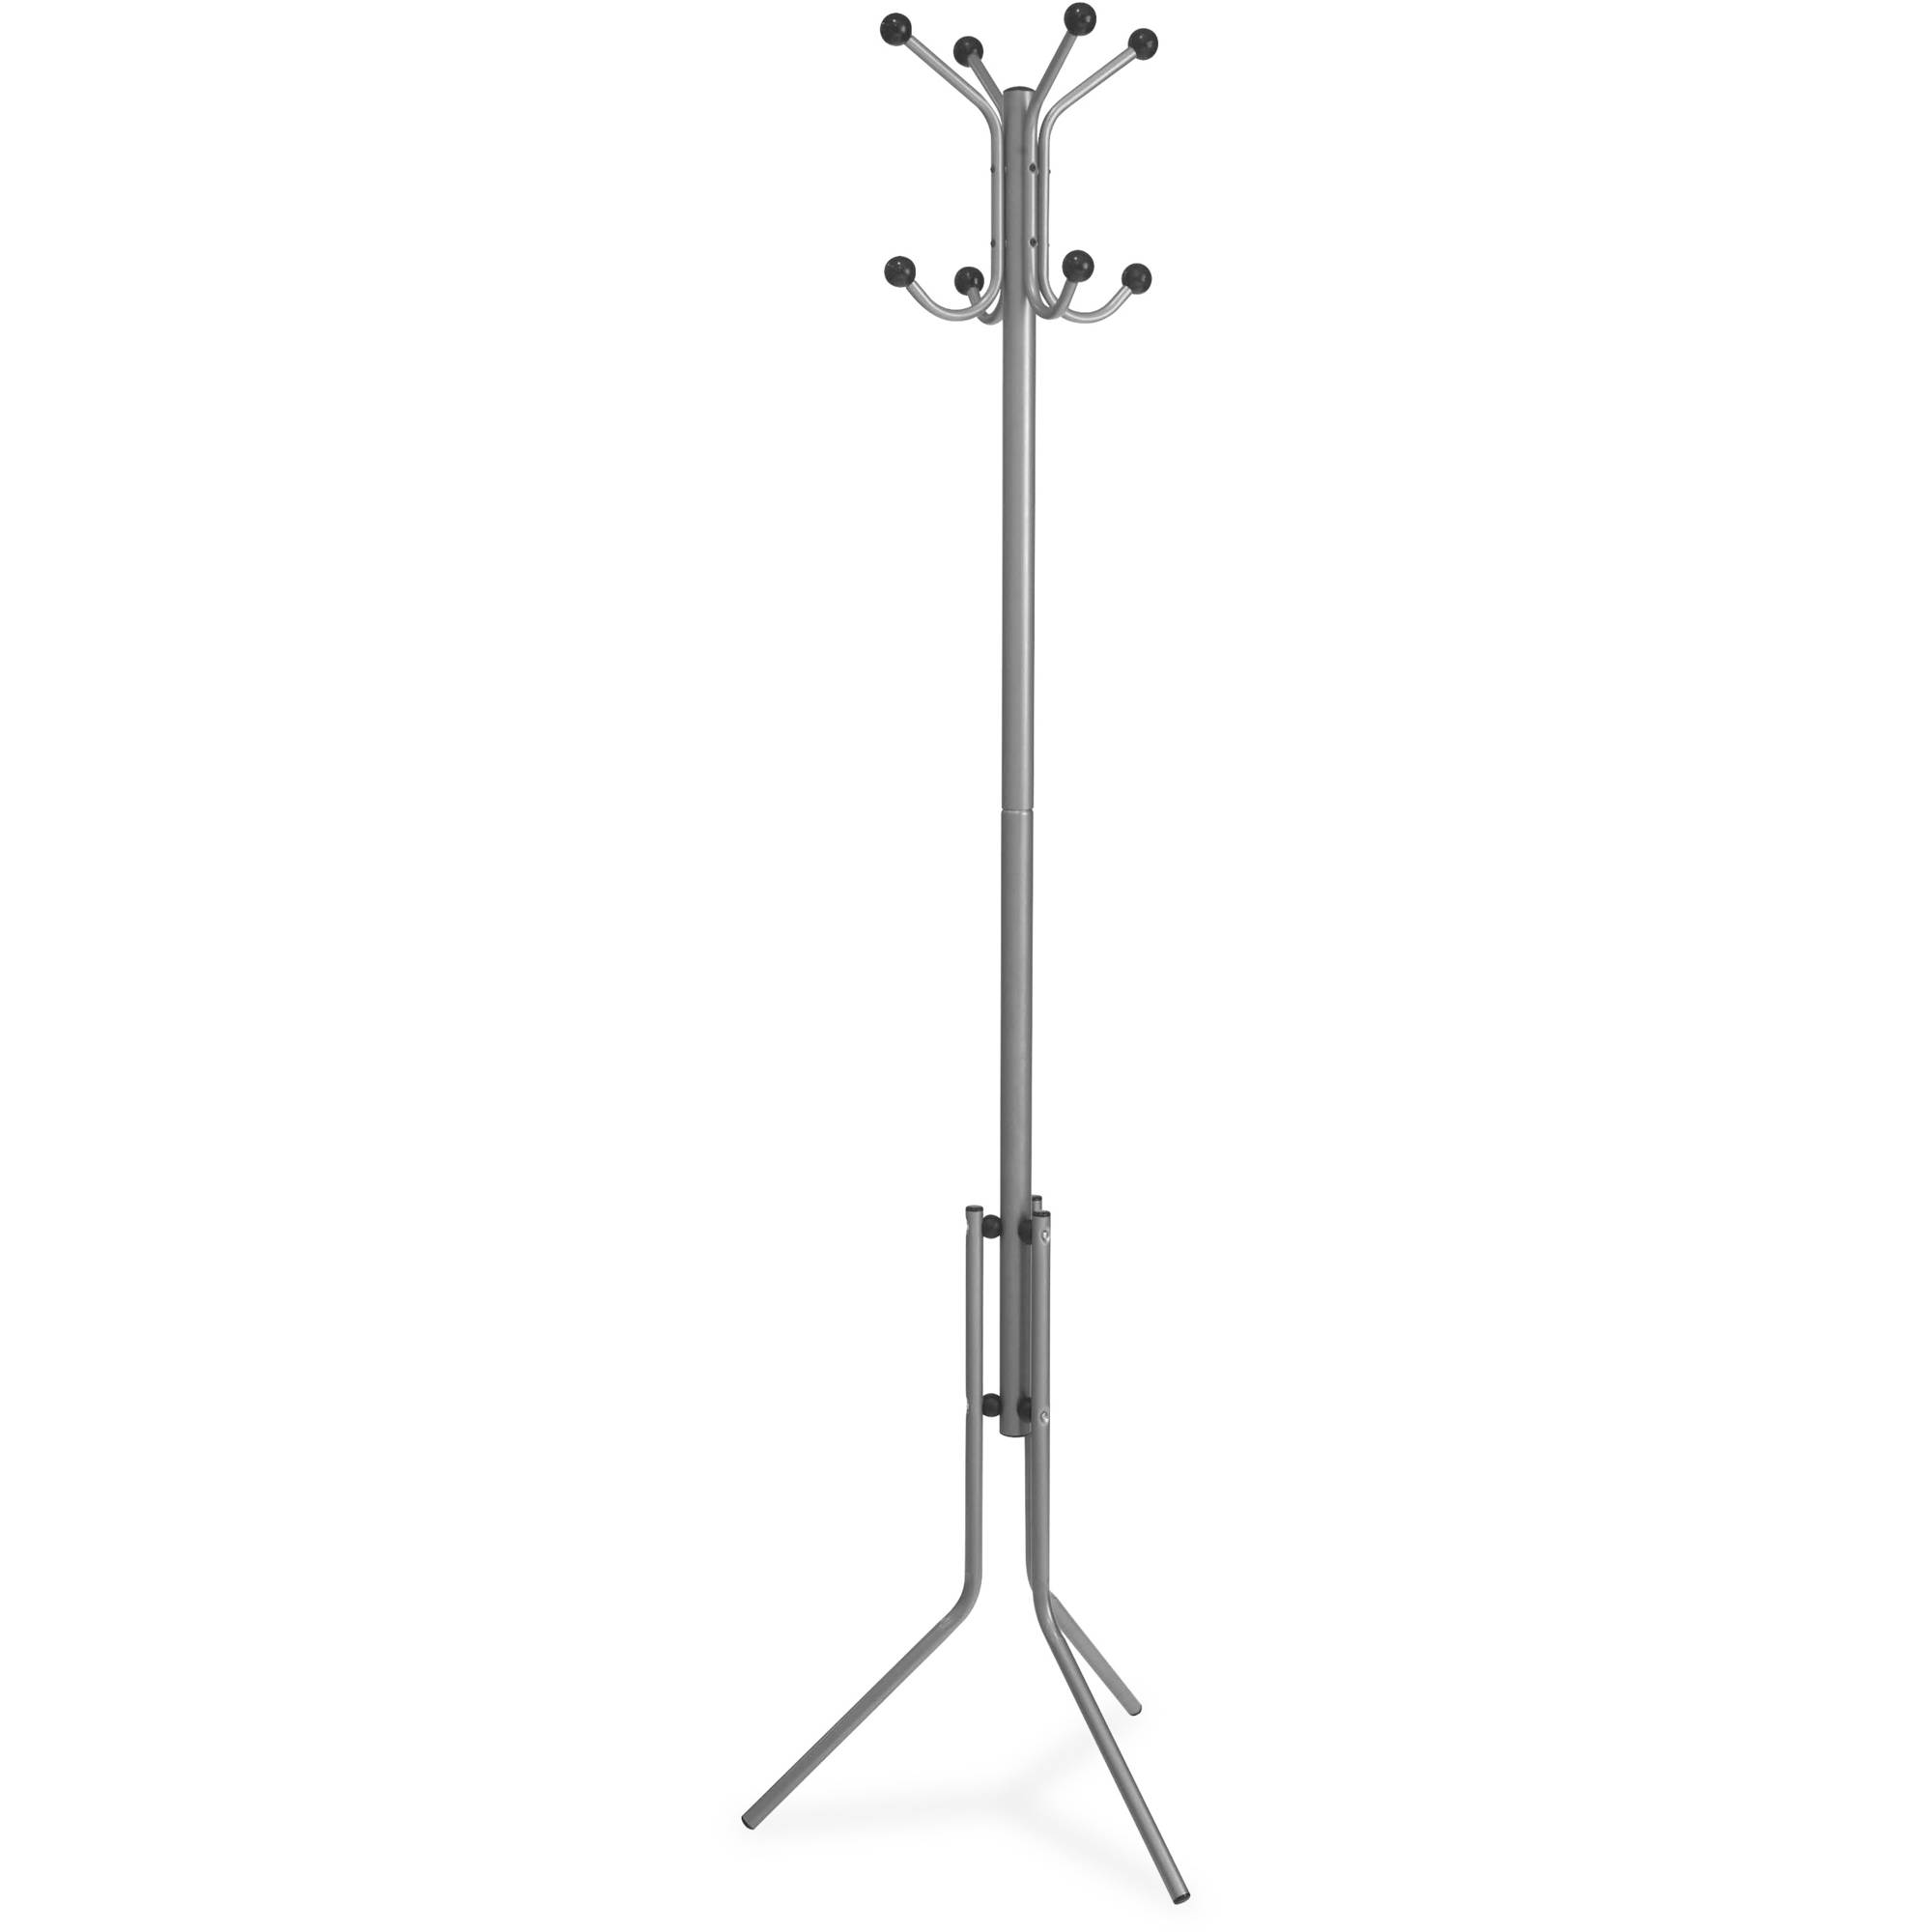 coat racks  umbrella stands  walmartcom - coat racks  umbrella stands under